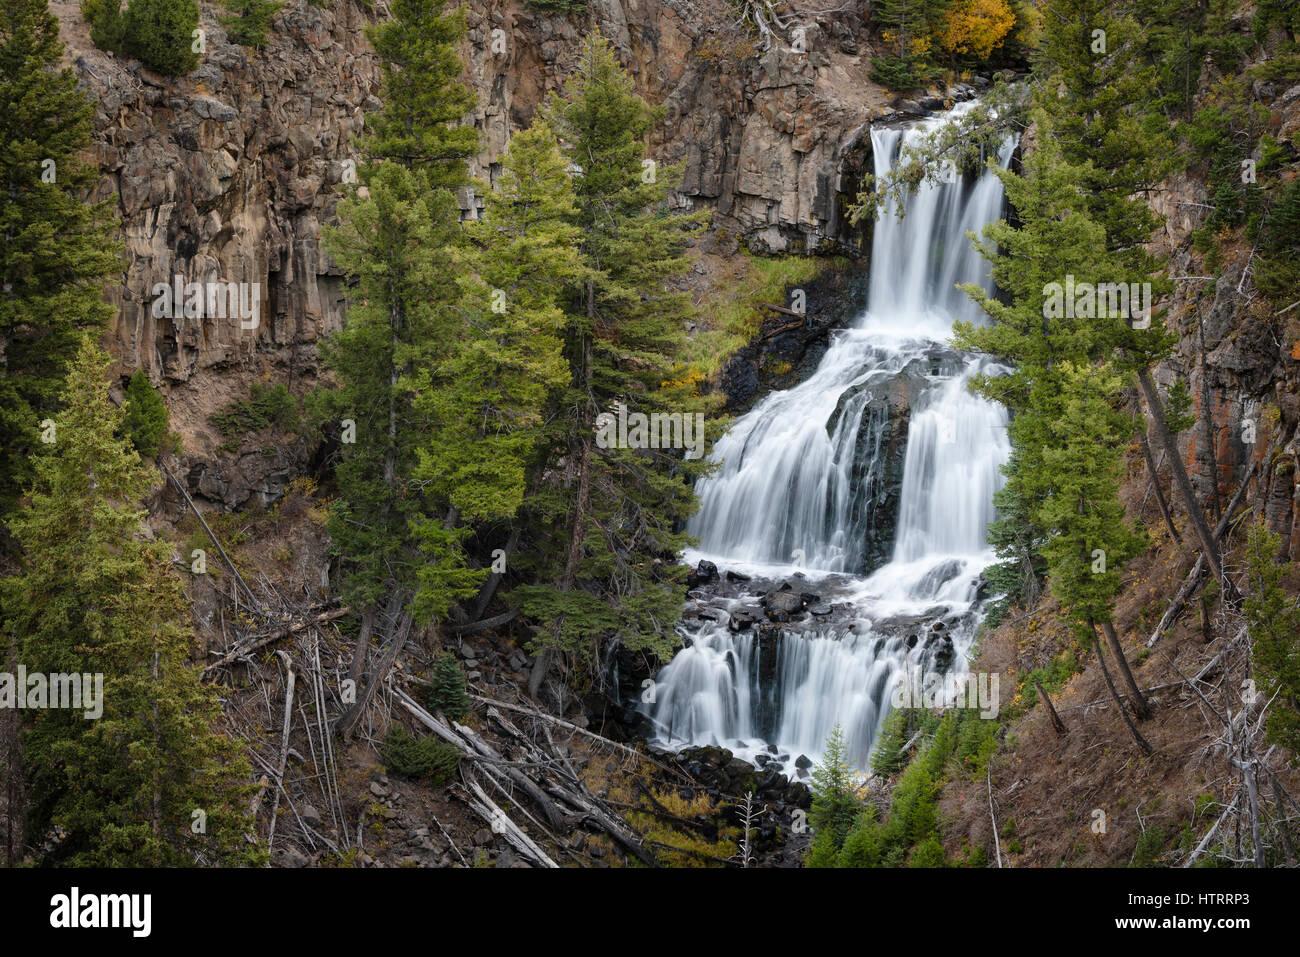 Undine Falls, Yellowstone National Park, Wyoming, USA - Stock Image